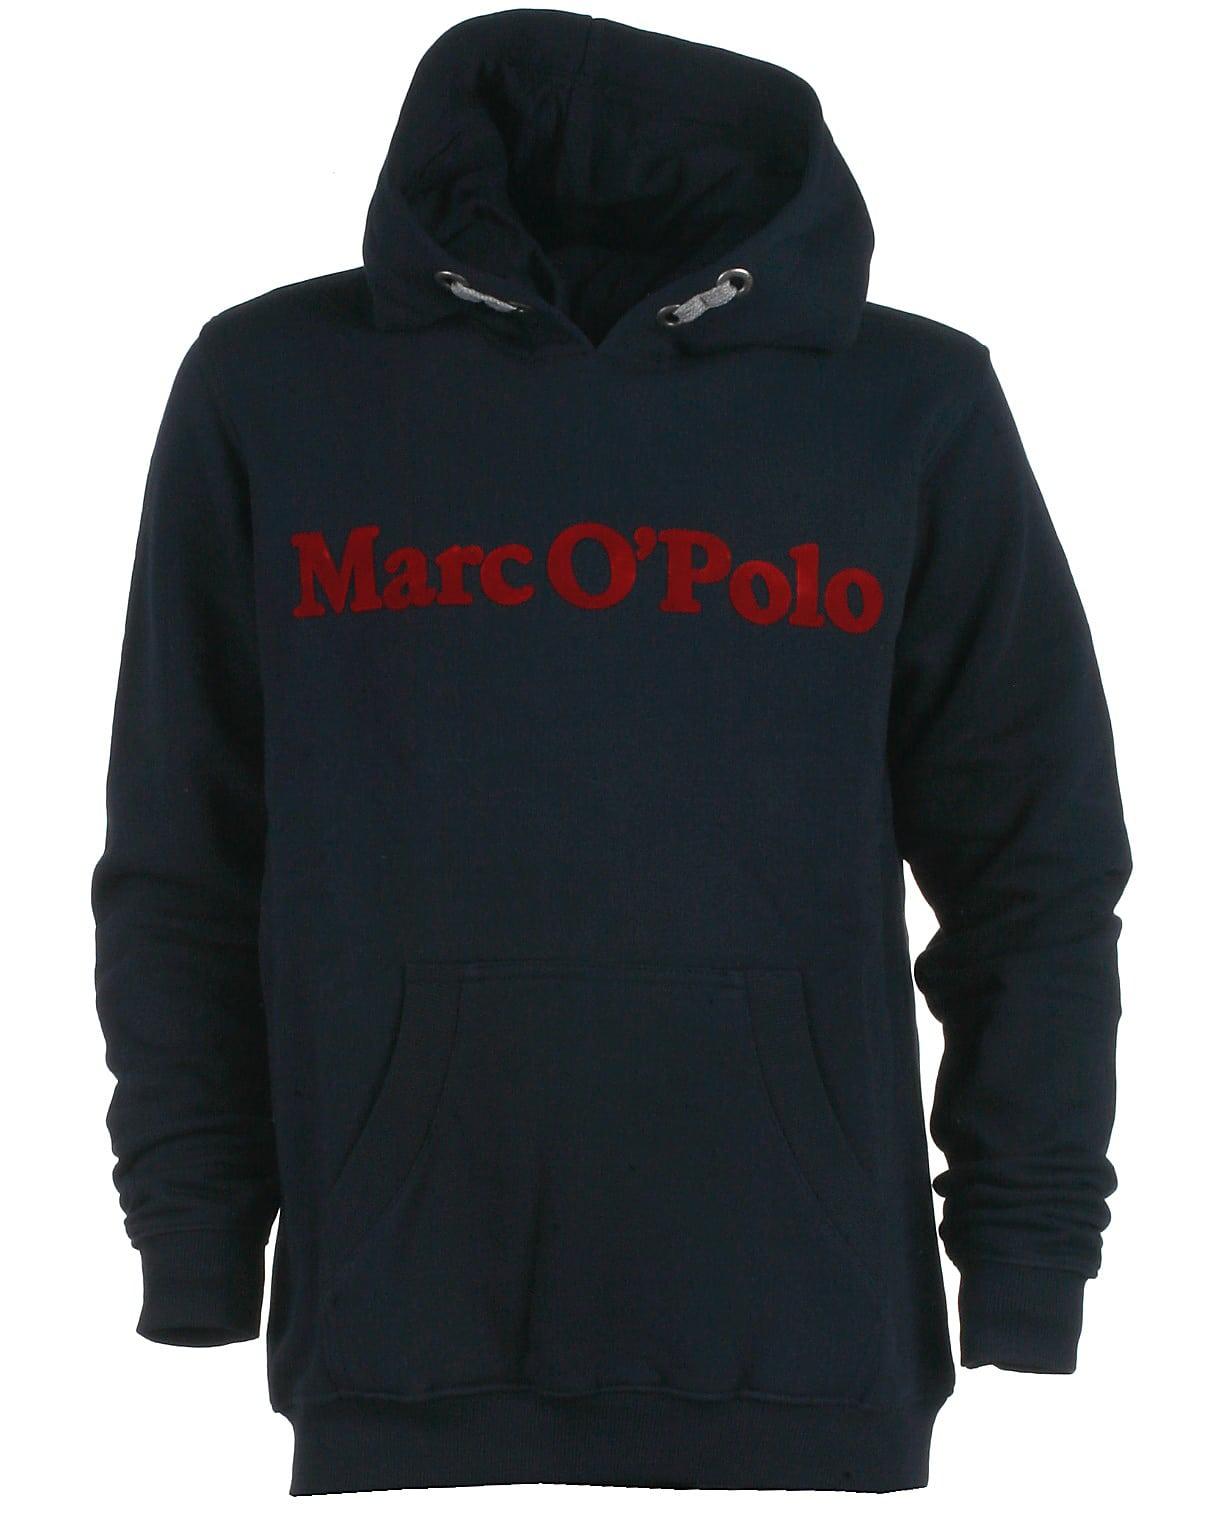 Image of Marc O'Polo hood sweat, navy